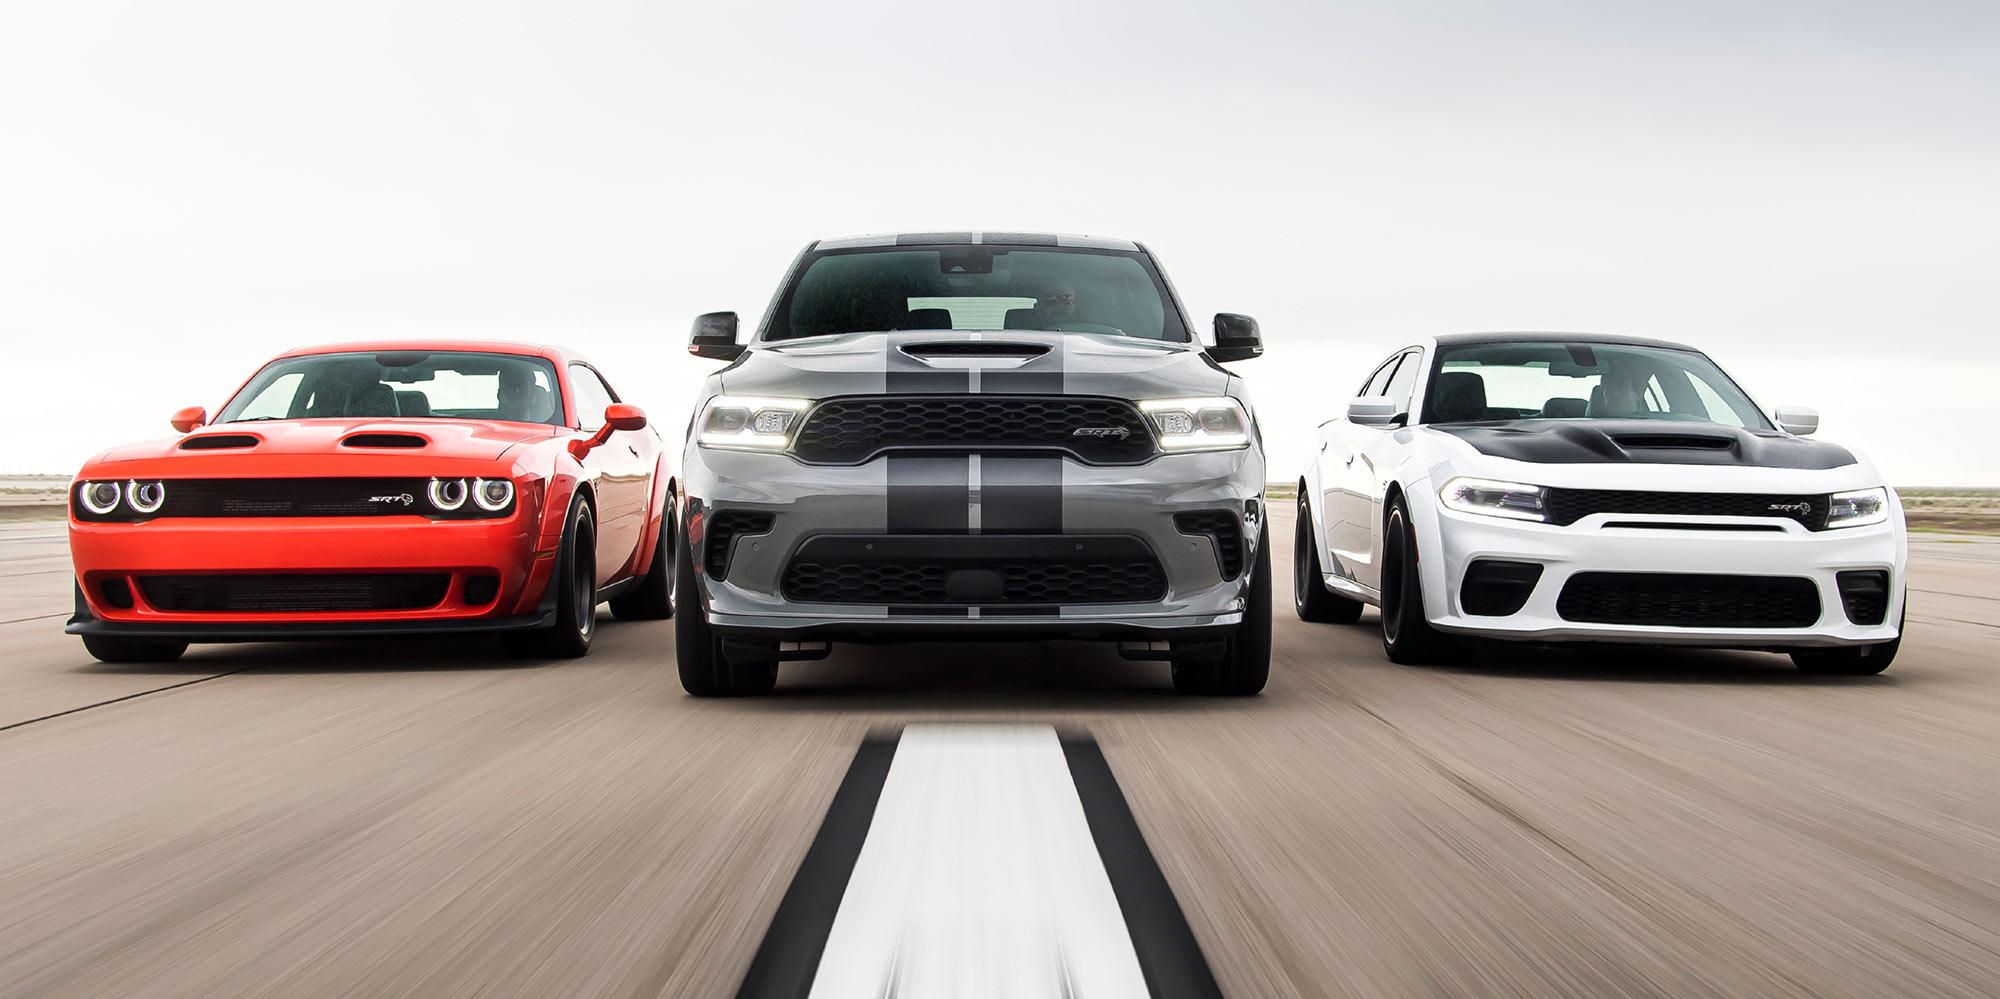 2020 Challenger SRT Super Stock, 2021 Durango SRT Hellcat and 2021 Charger SRT Hellcat Redeye